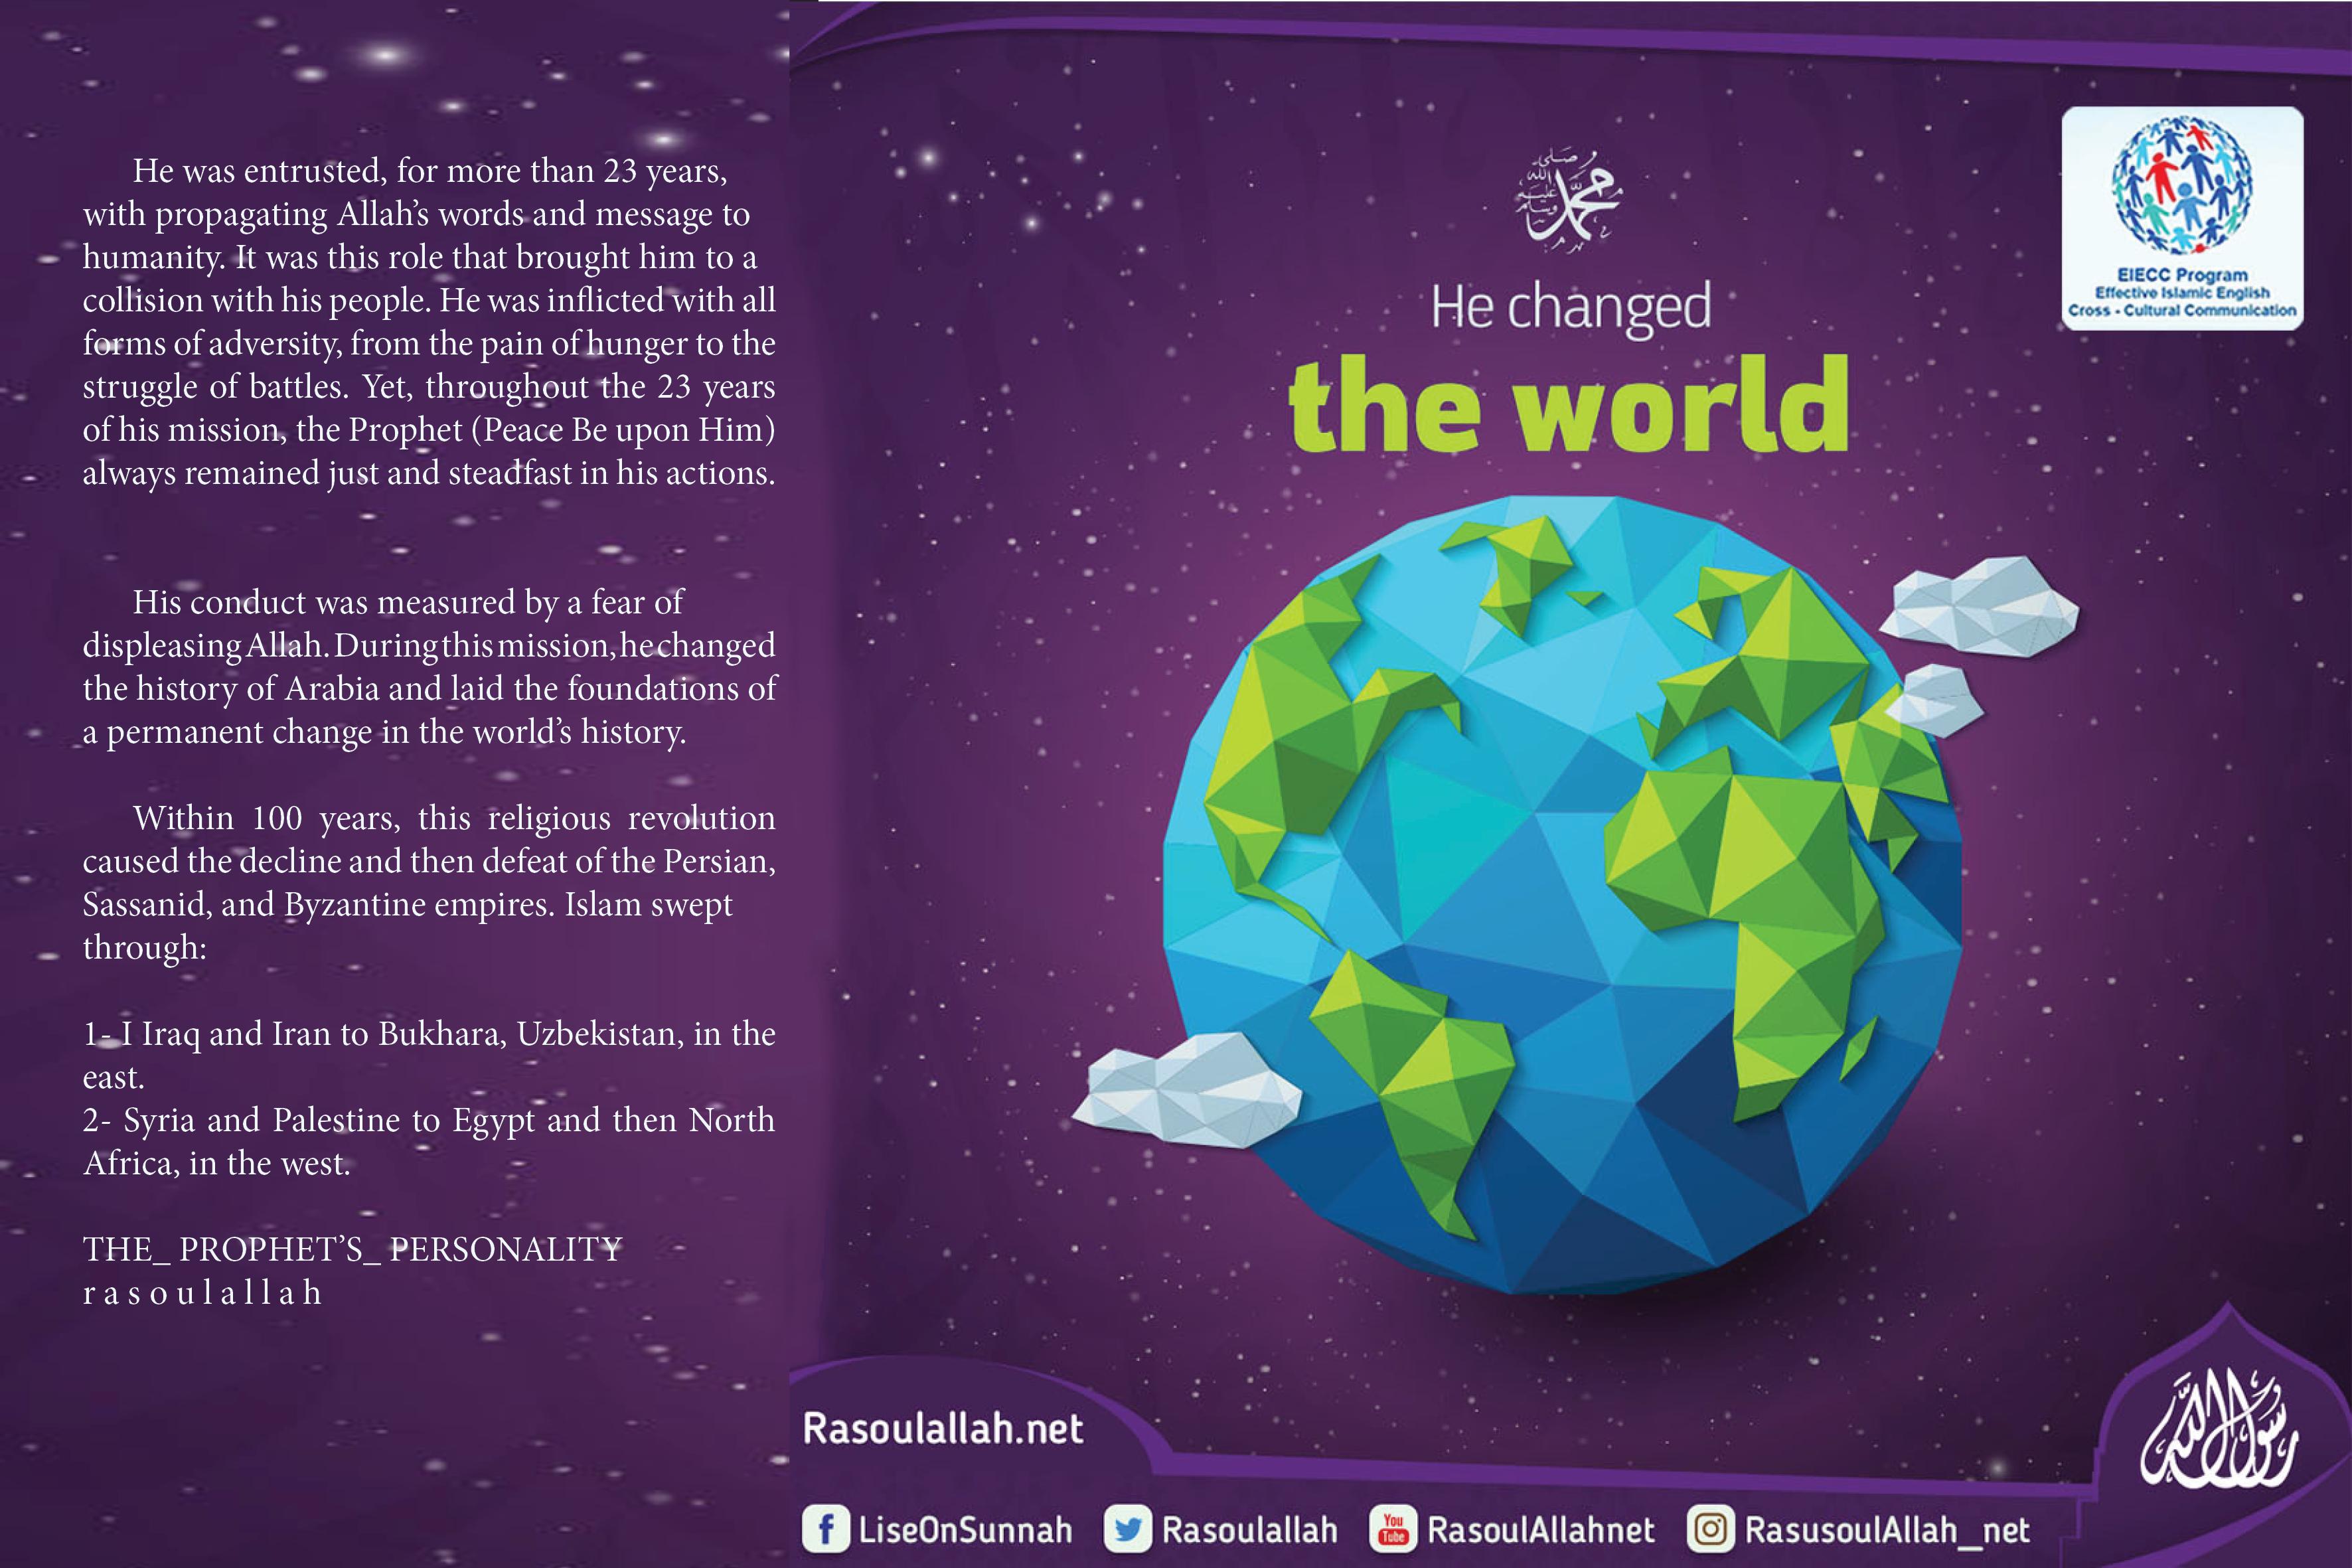 Prophet Muhammad changed the world